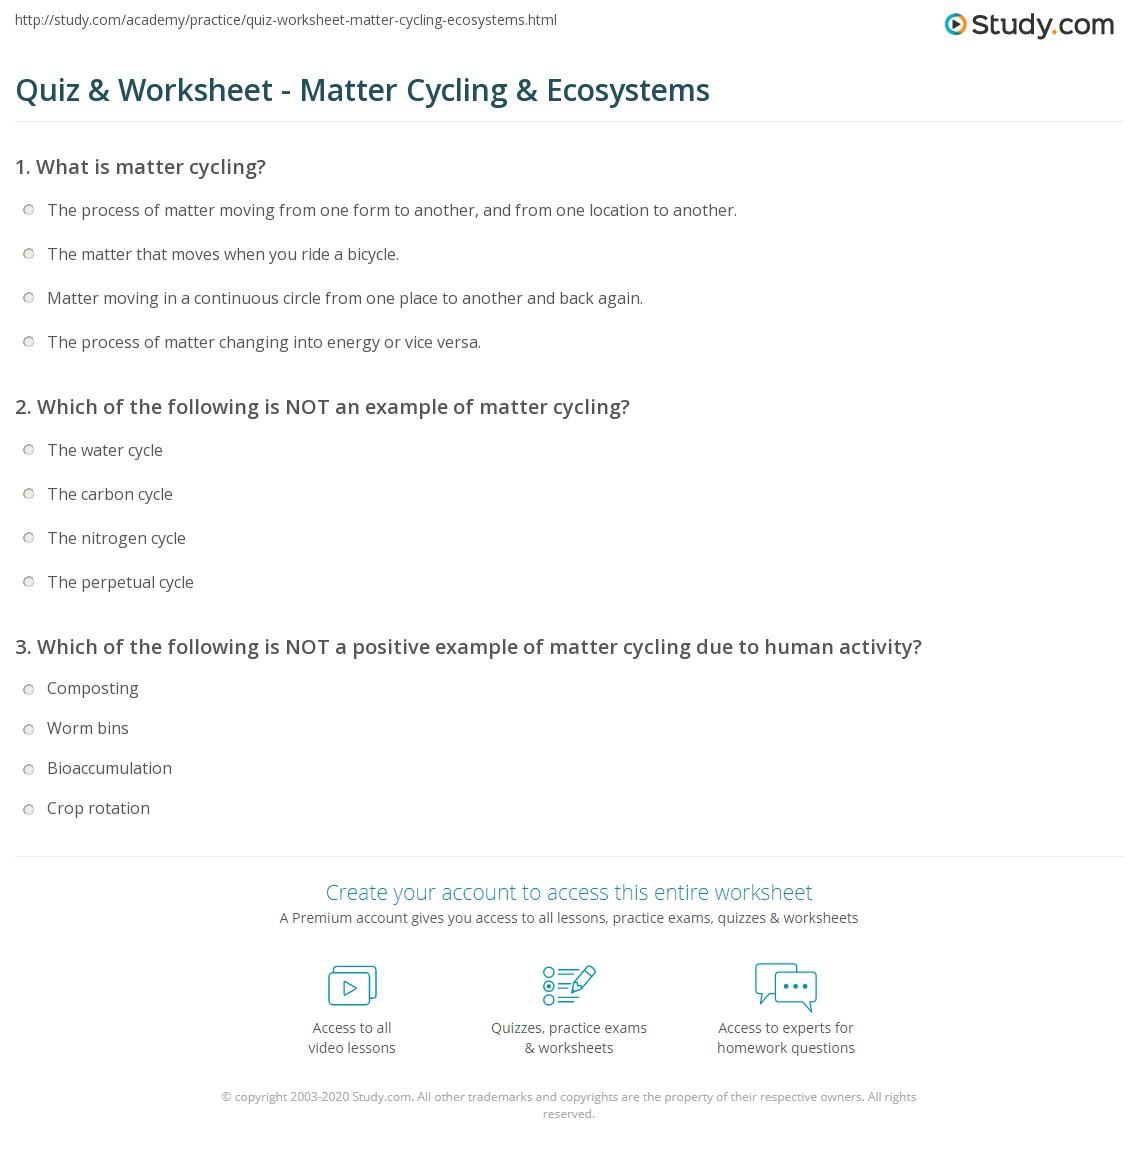 worksheet Cycling Of Matter Worksheet quiz worksheet matter cycling ecosystems study com print how can impact environmental health worksheet